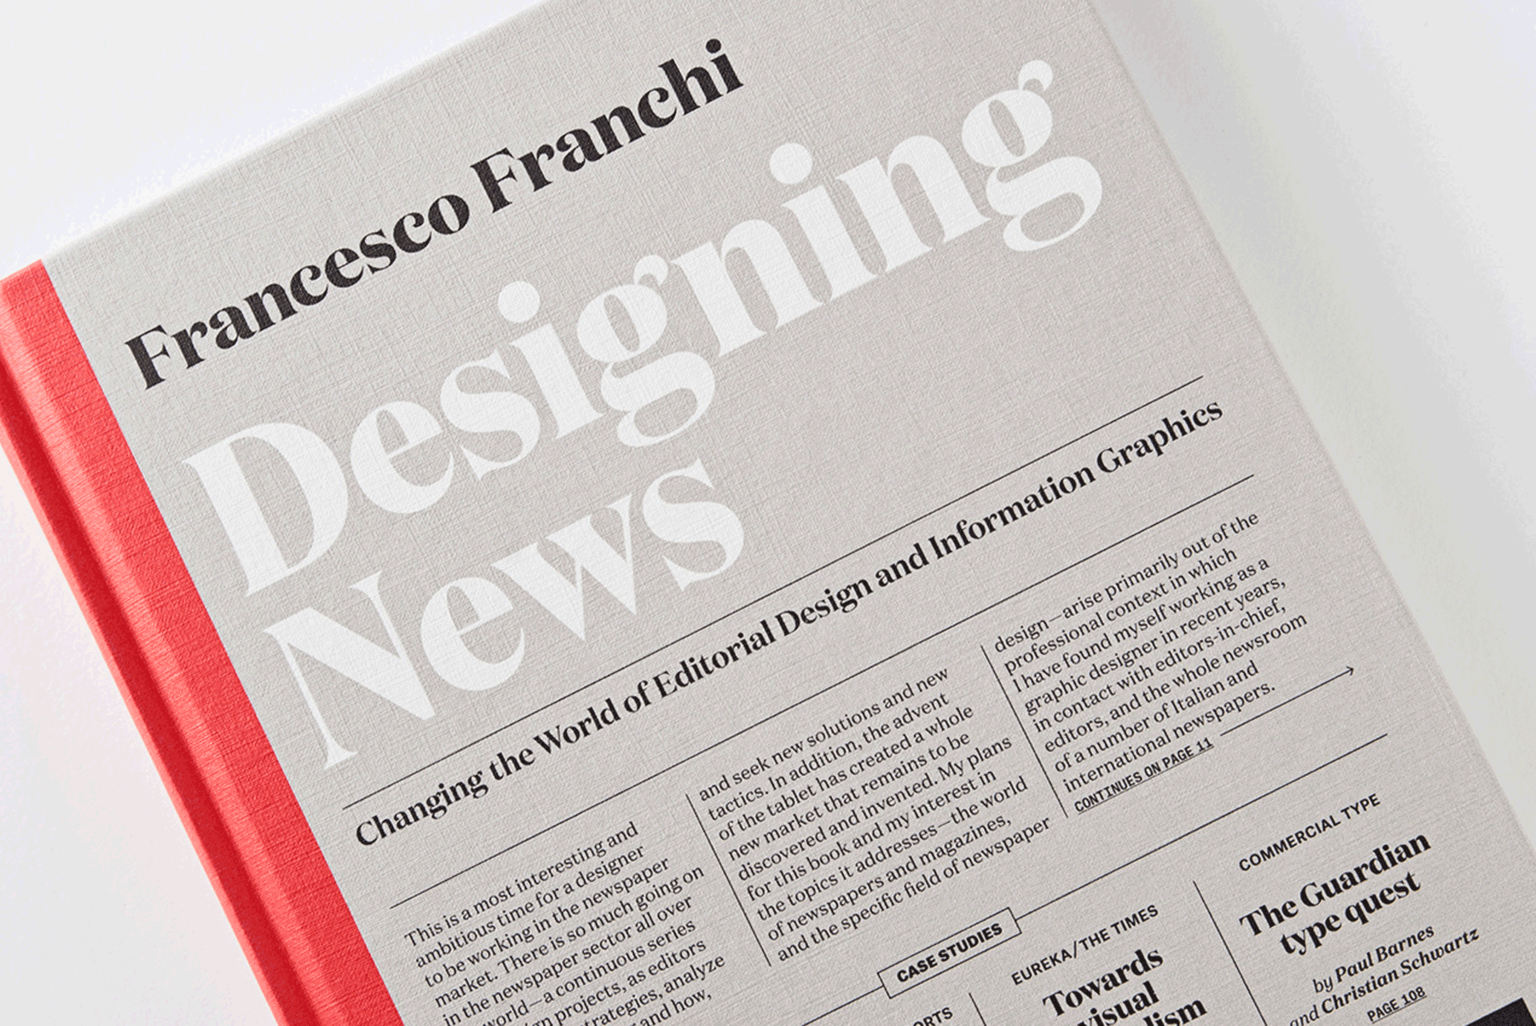 Vllg designingnews